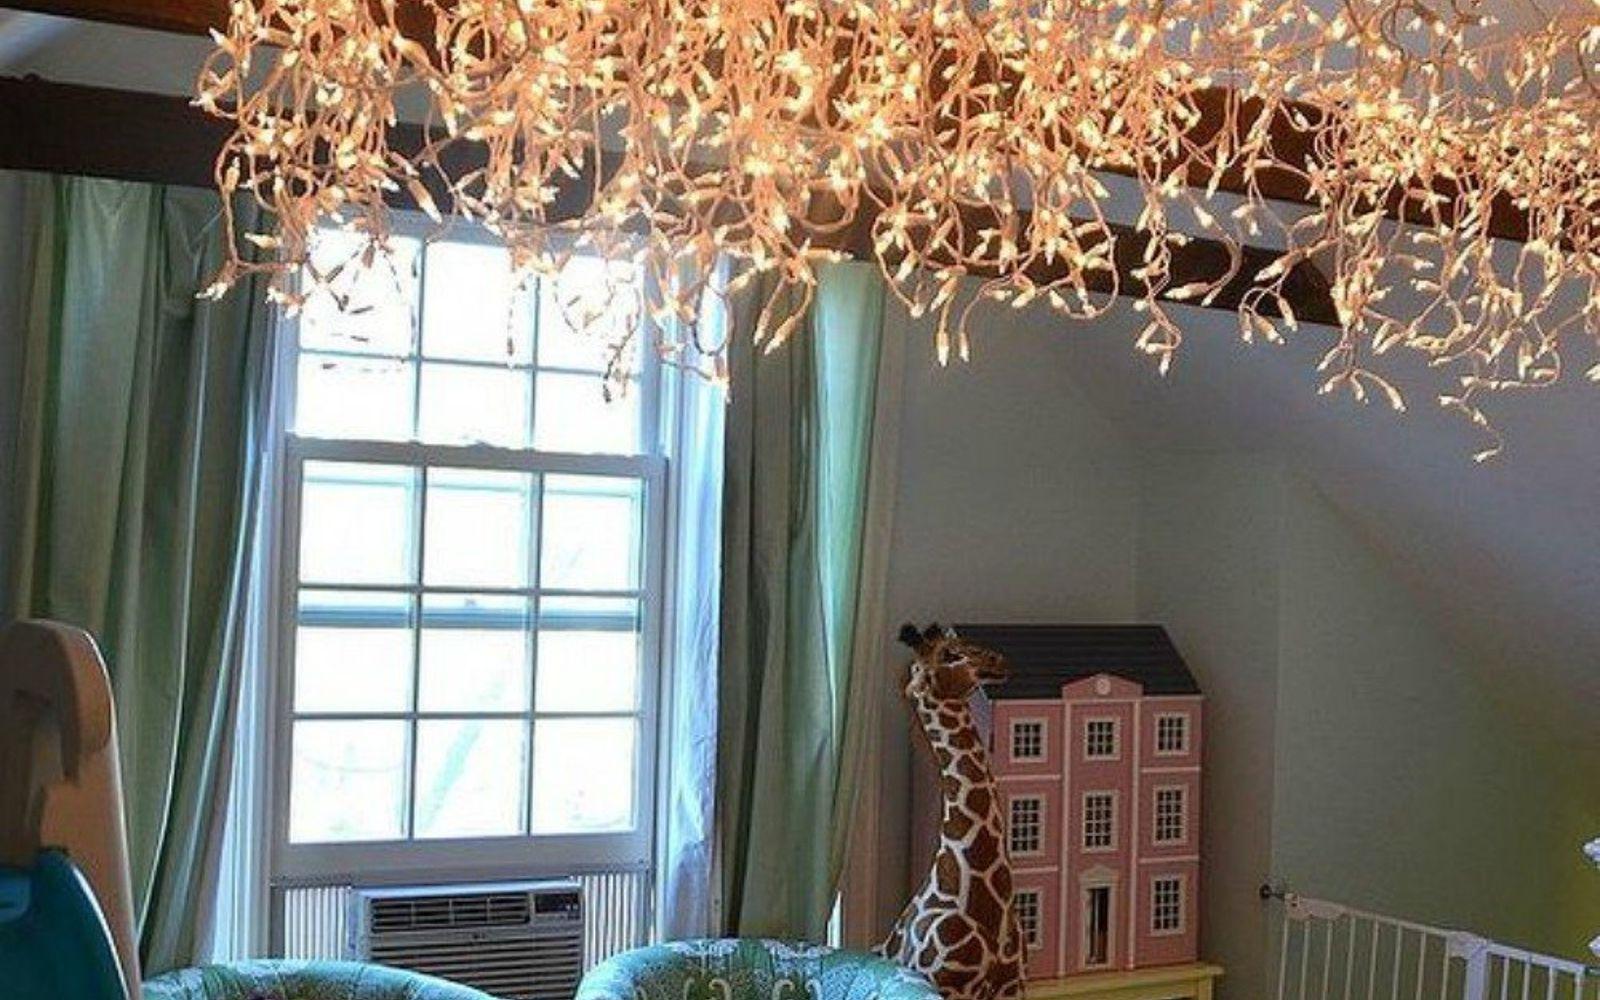 14 amazing fairy light ideas we u0026 39 re definitely going to